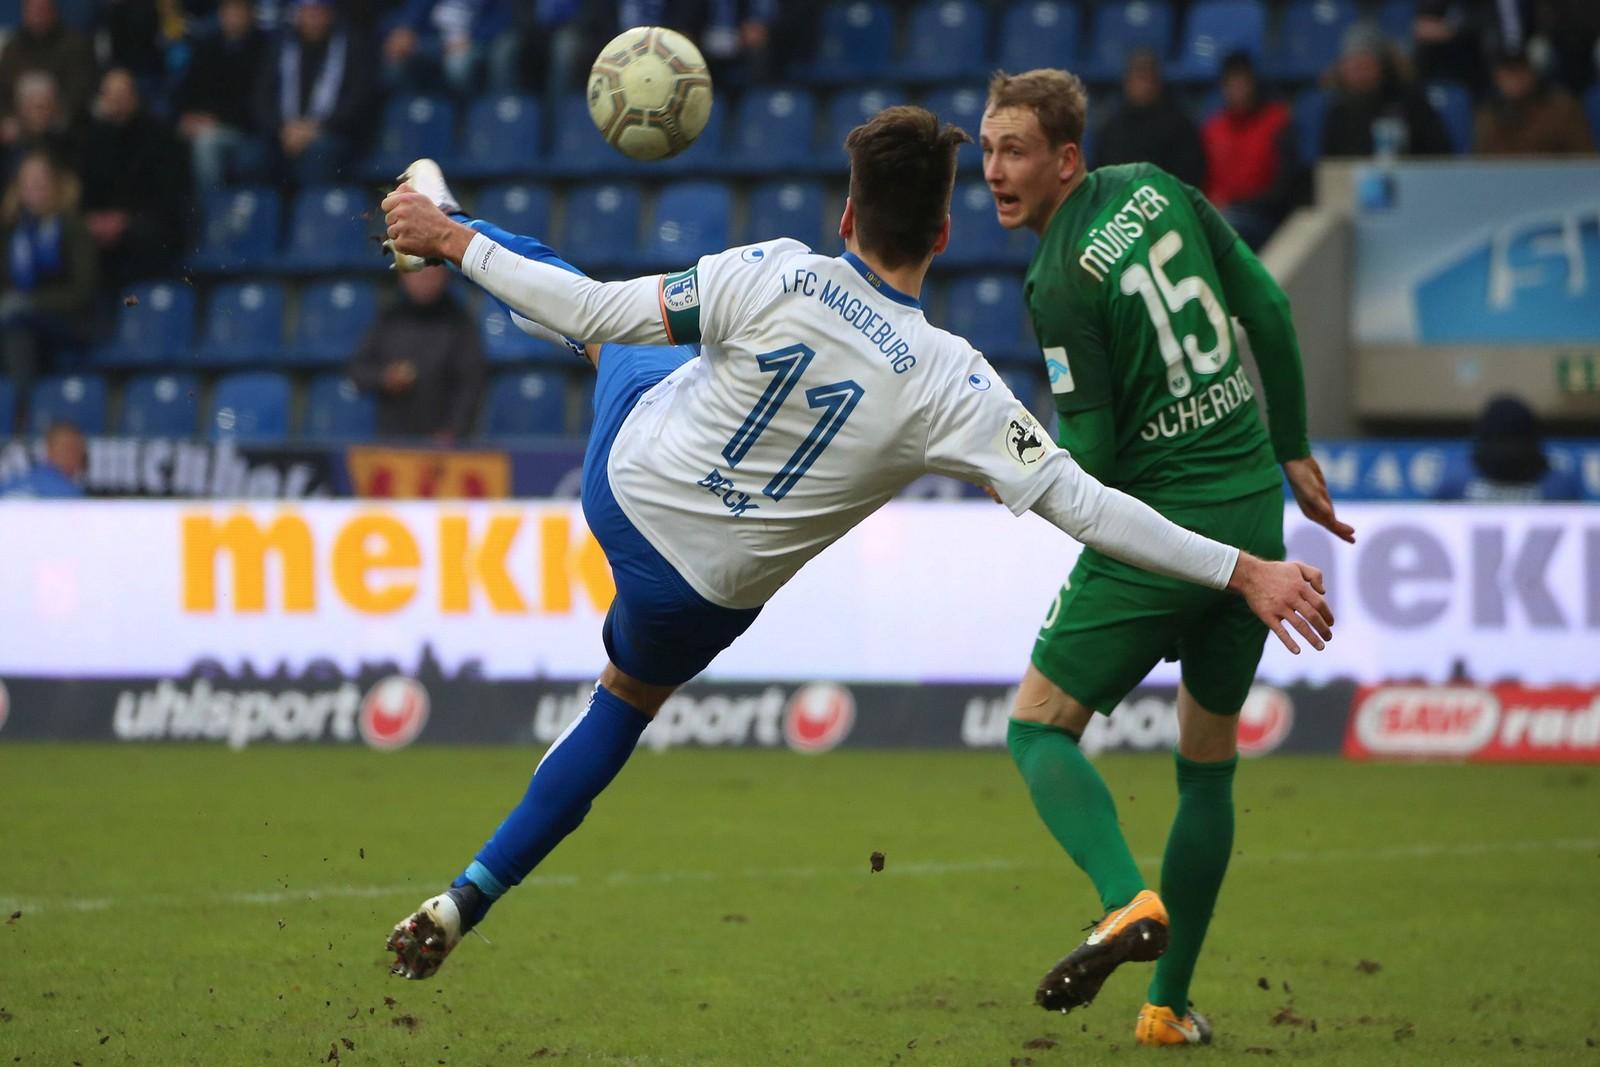 Christian Beck vom 1. FC Magdeburg trifft gegen Preußen Münster.